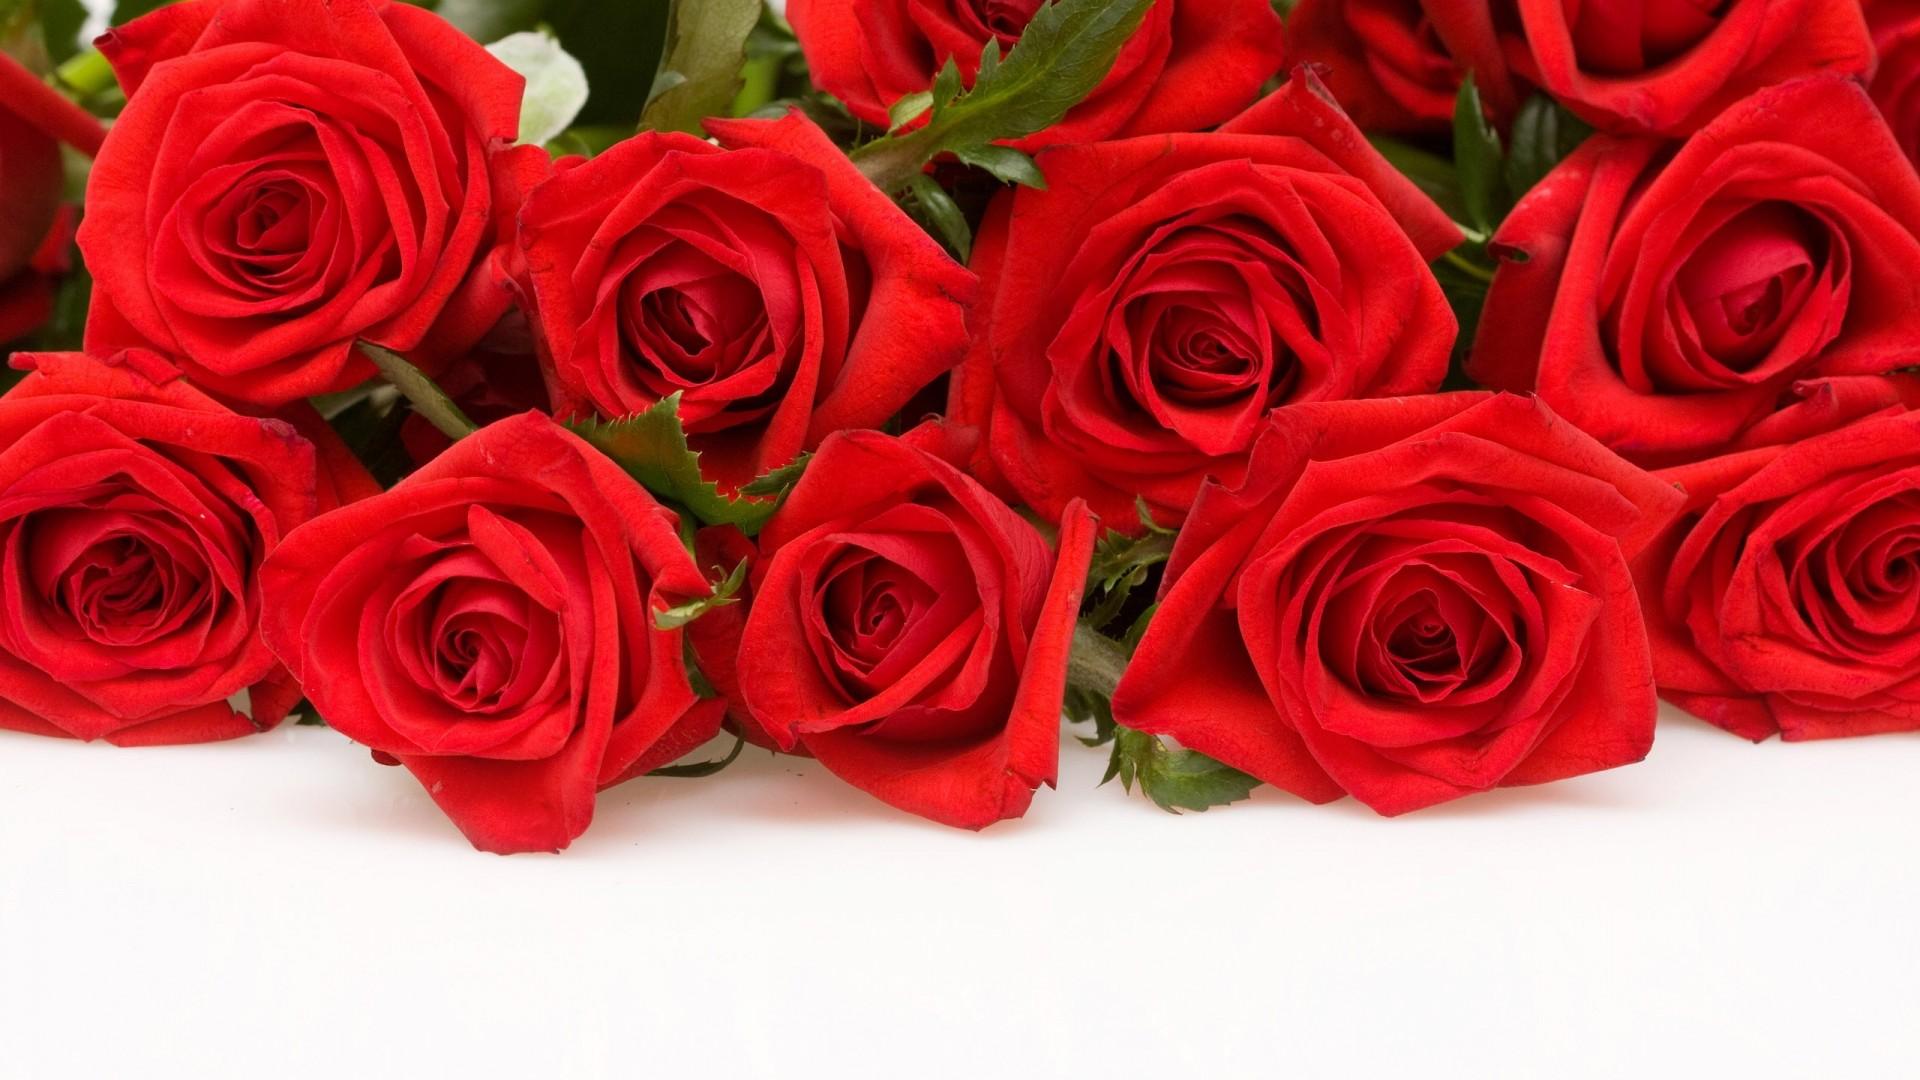 Red Rose Wallpaper Desktop 60 Pictures